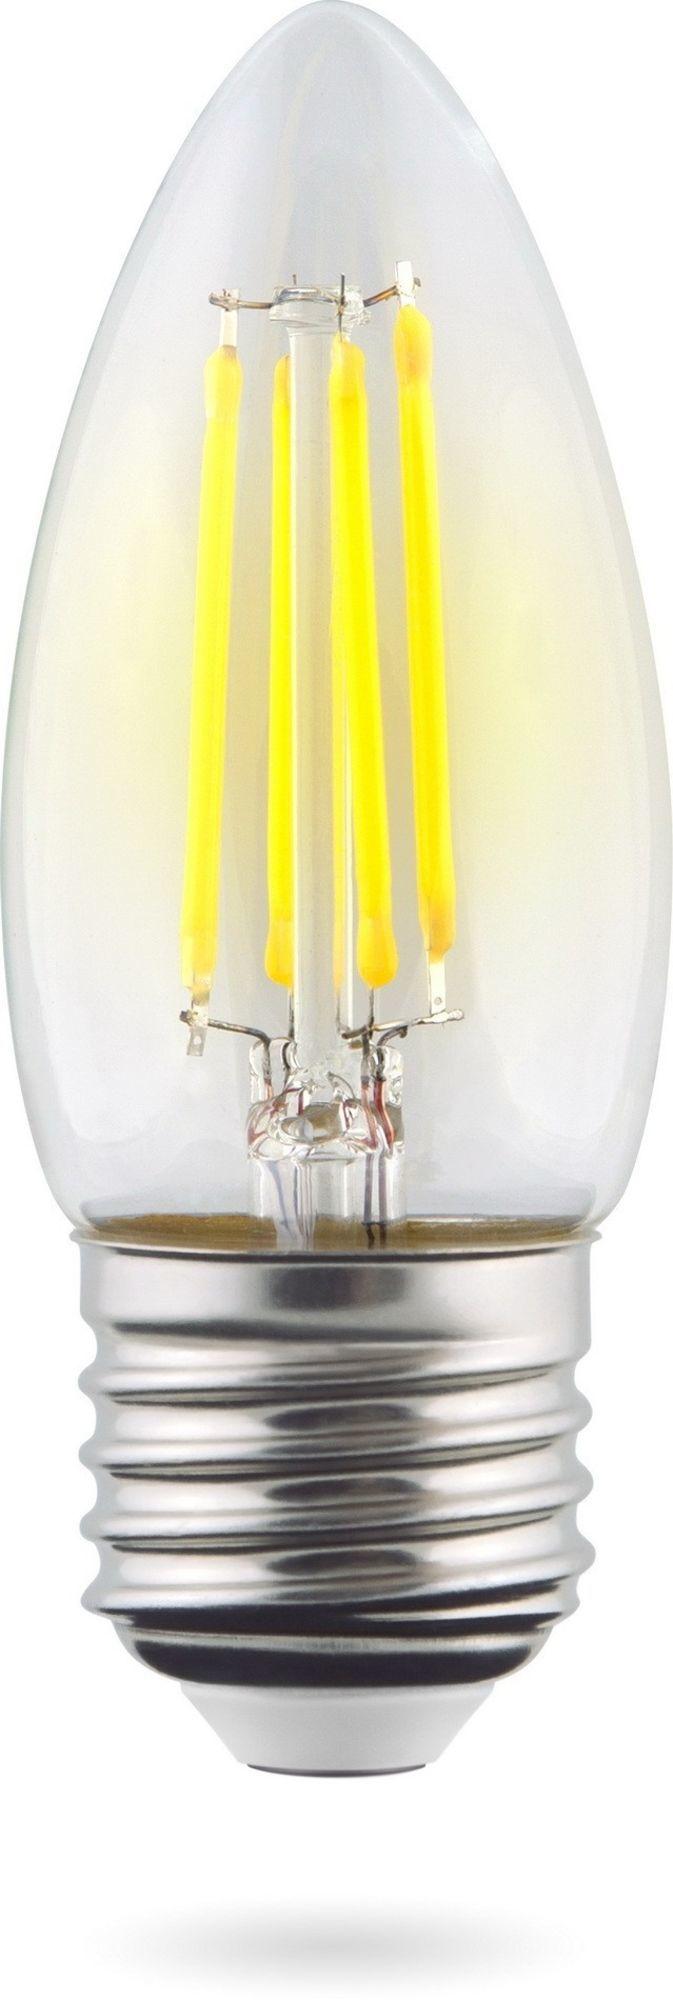 Филаментная светодиодная лампа Voltega VG10-C1E27warm4W-F 8334 свеча E27 4W, 2800K (теплый), гарантия 3 года - фото 1